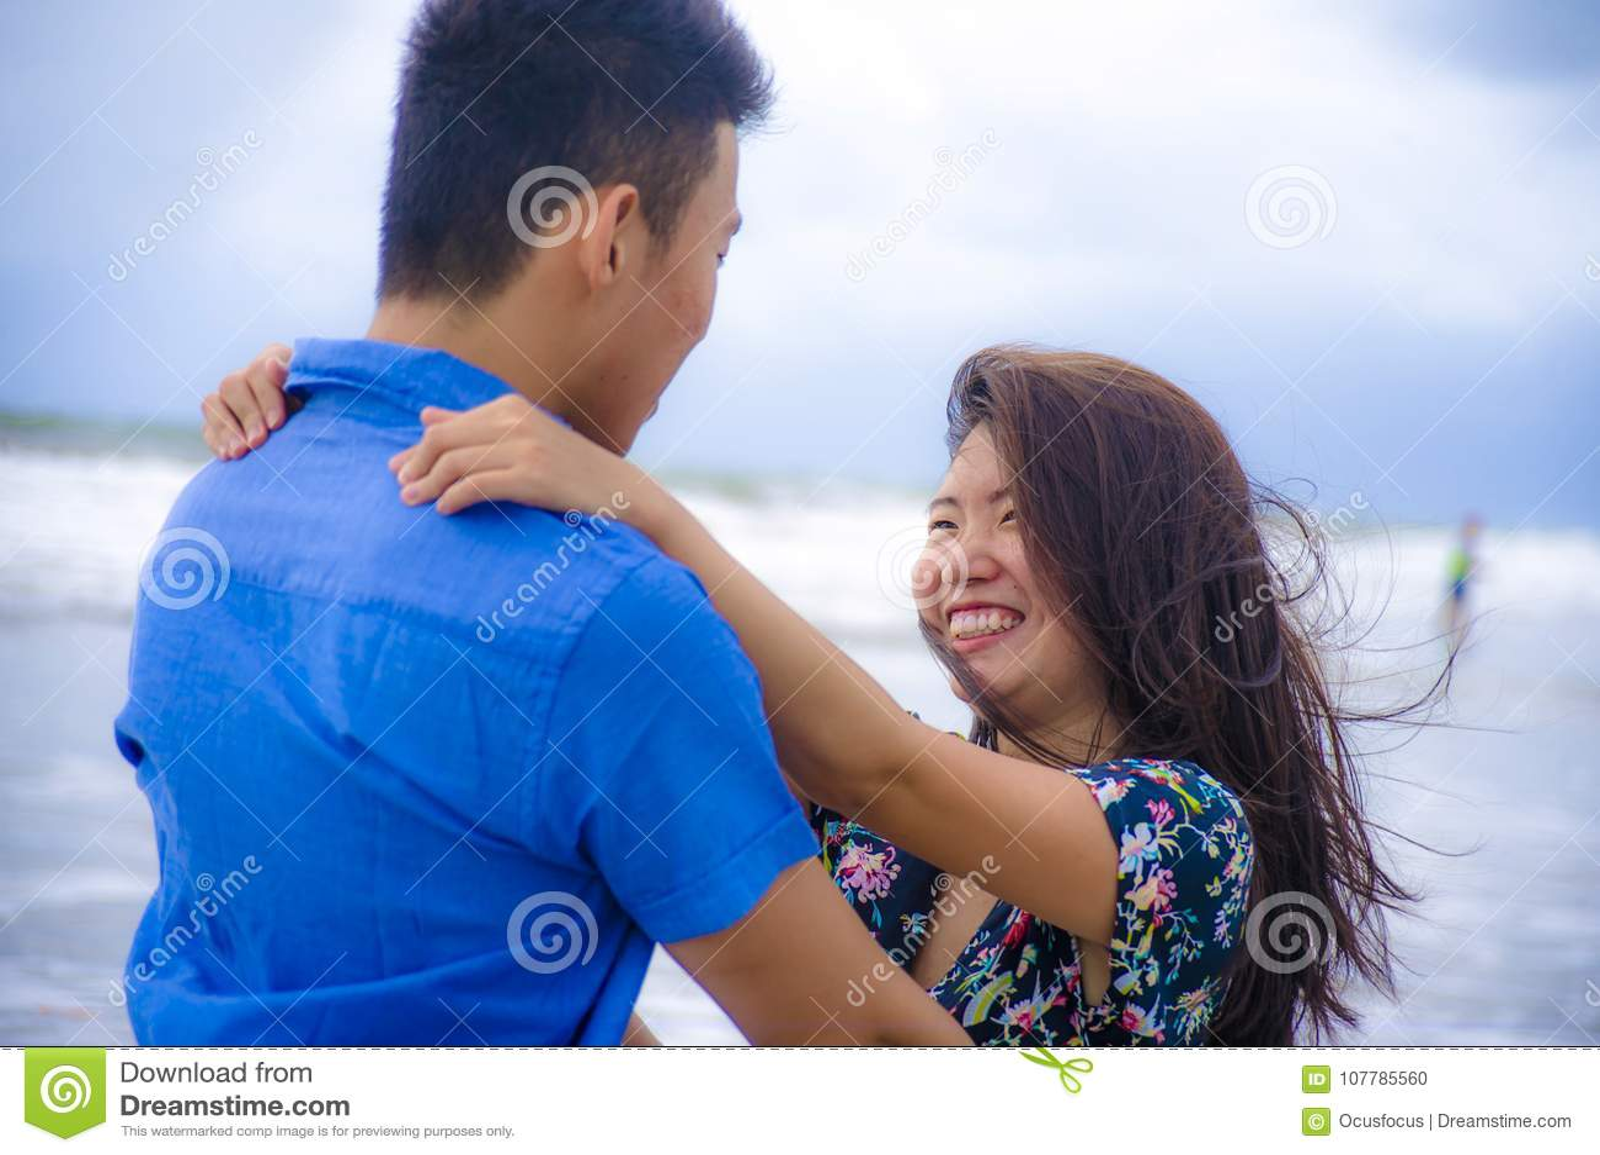 How to hug your boyfriend romantically